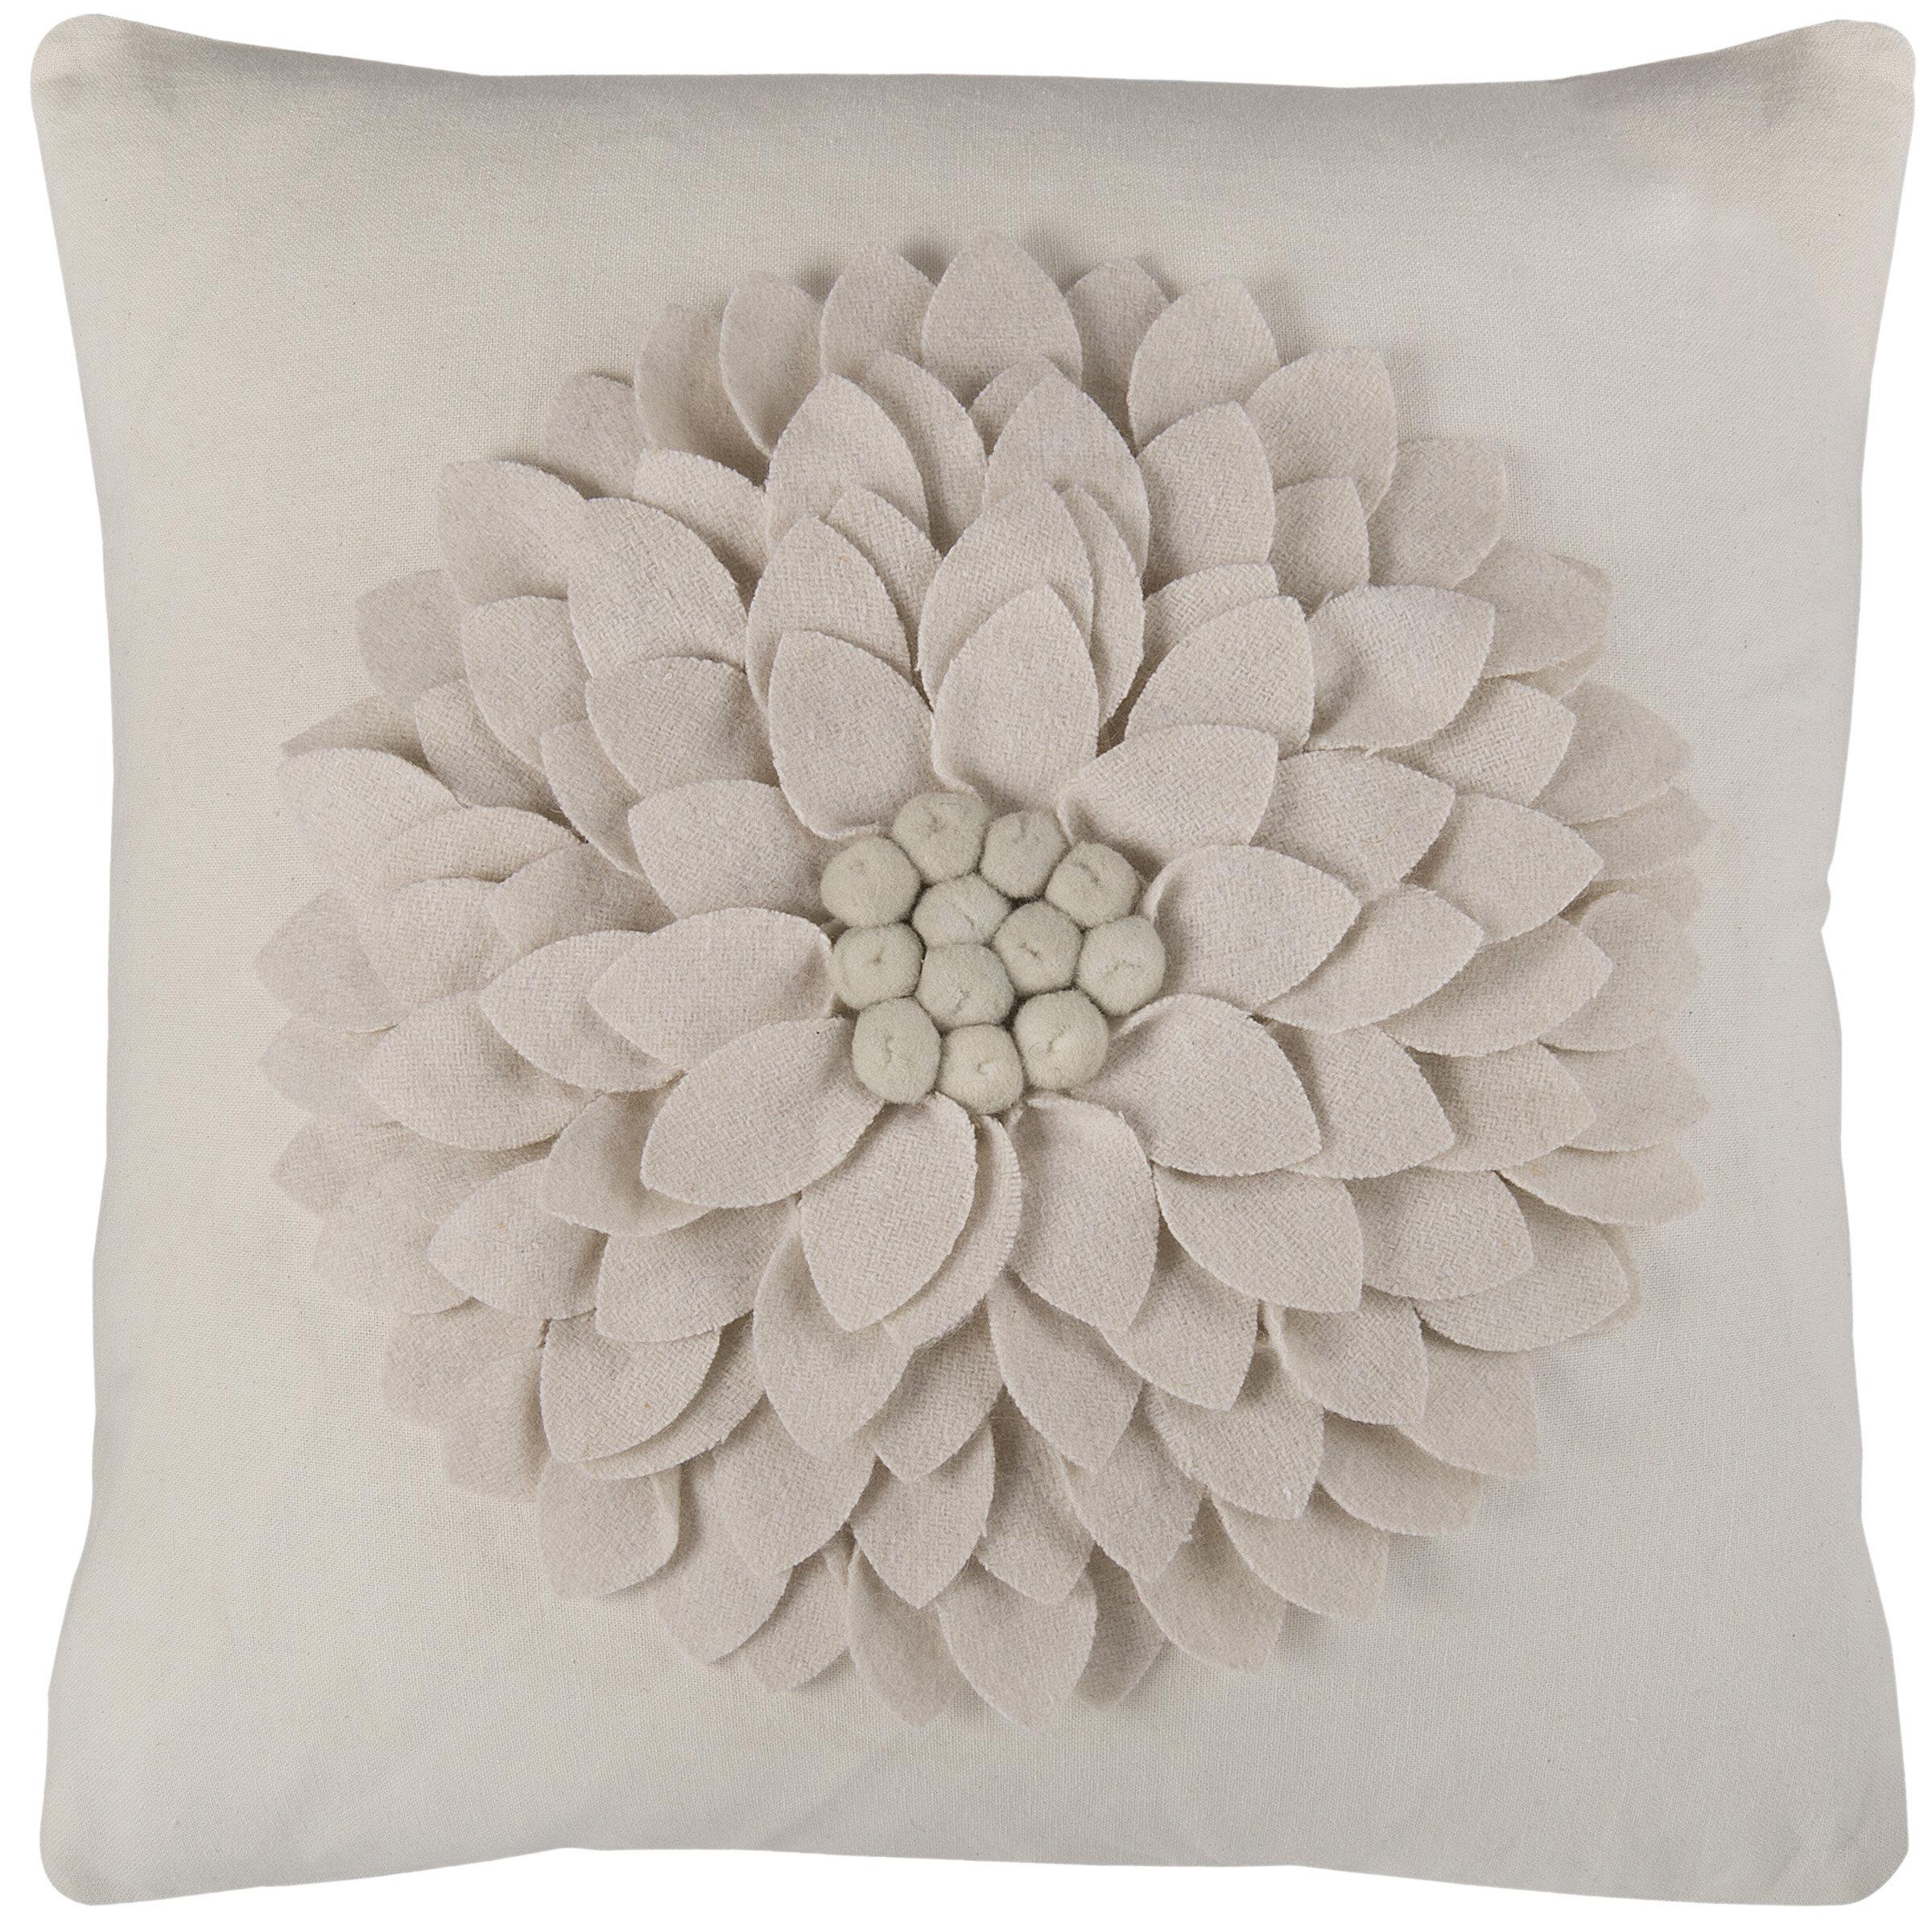 Ivory Cream Wildon Home Throw Pillows You Ll Love In 2021 Wayfair